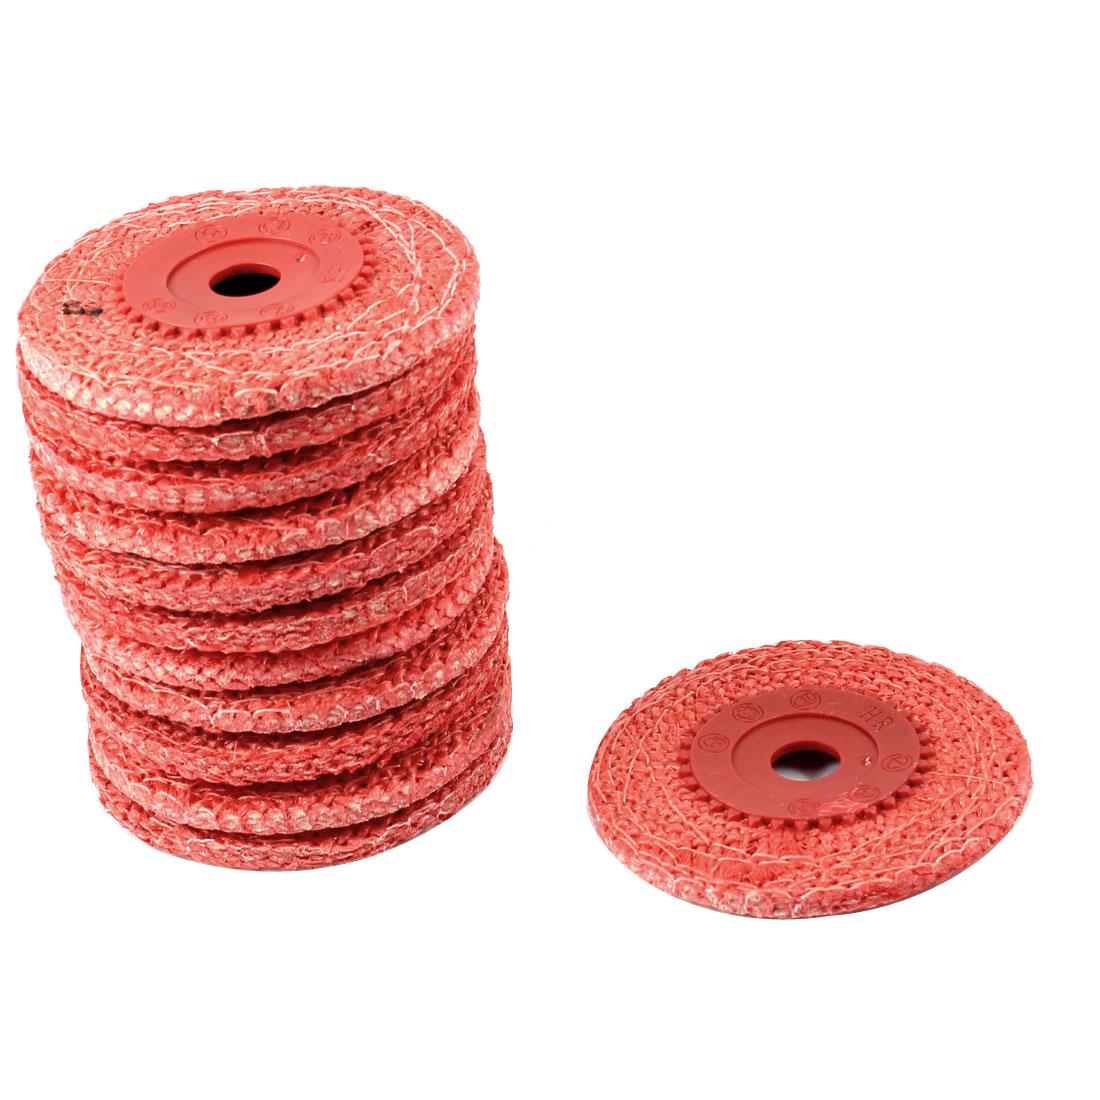 "12 Pcs 4"" Dia Hemp Rope Abrasive Flap Disc Polishing Grinding Wheel"